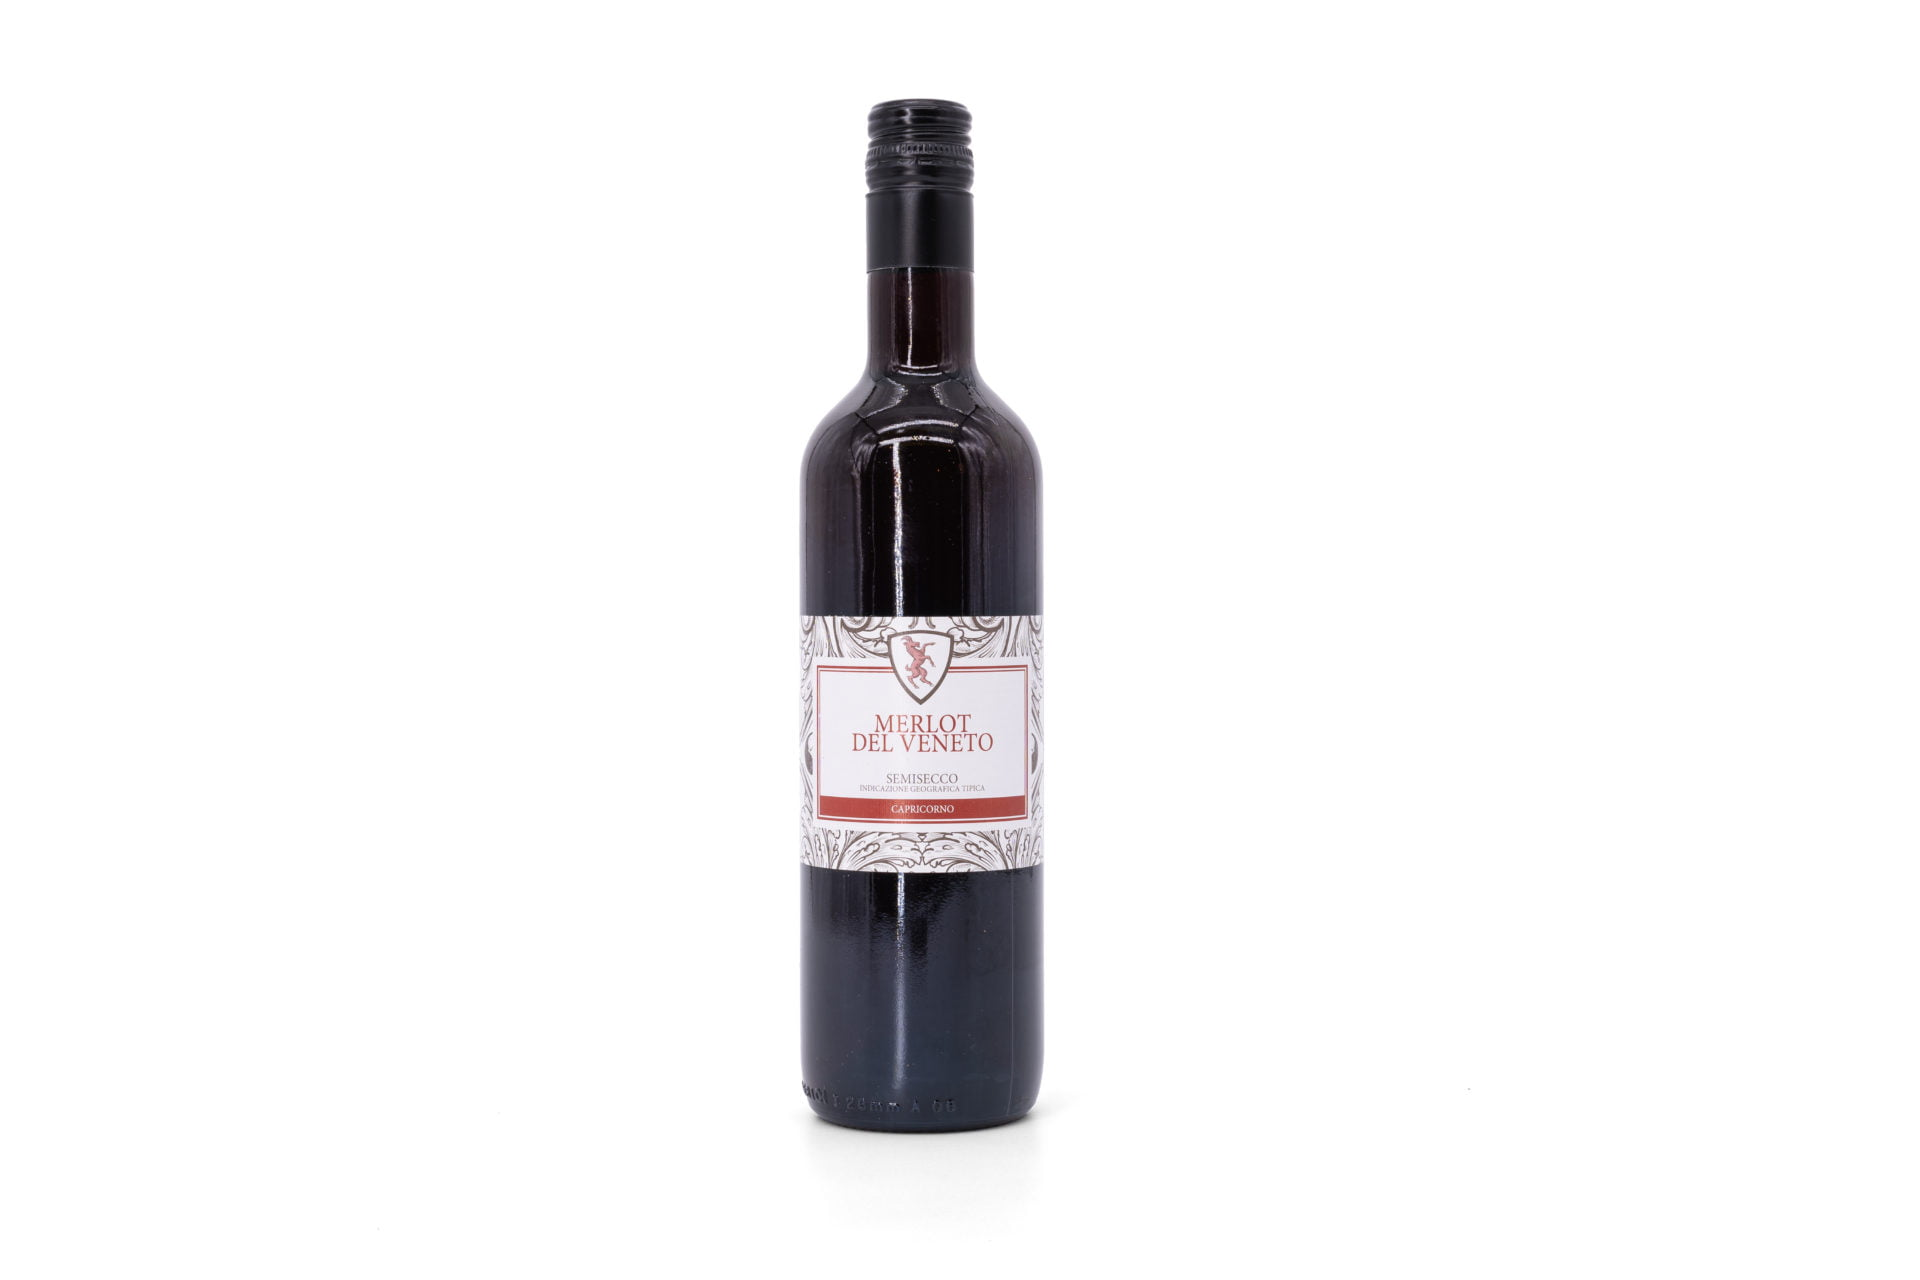 Best Pizza Wein Merlot del Veneto